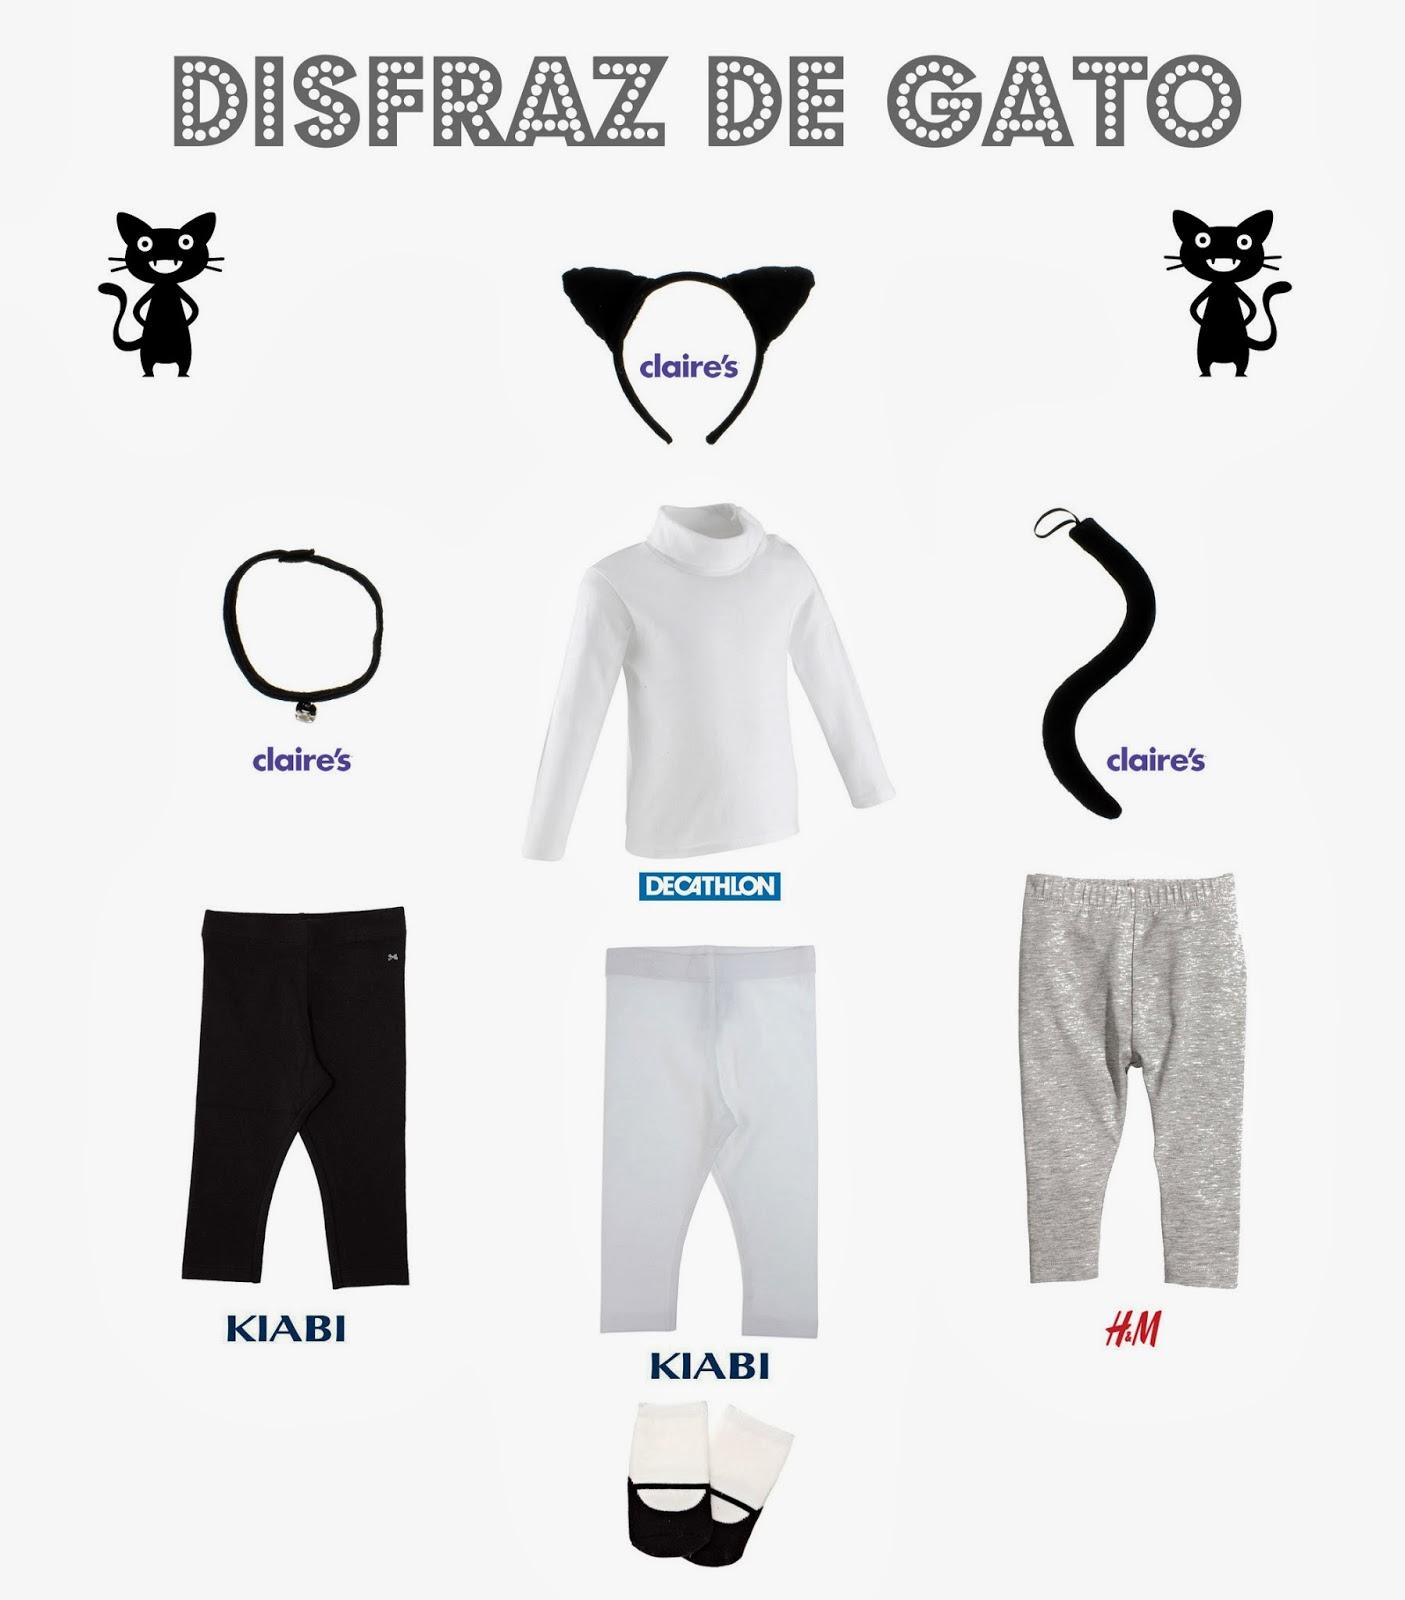 Disfraz gato bebe